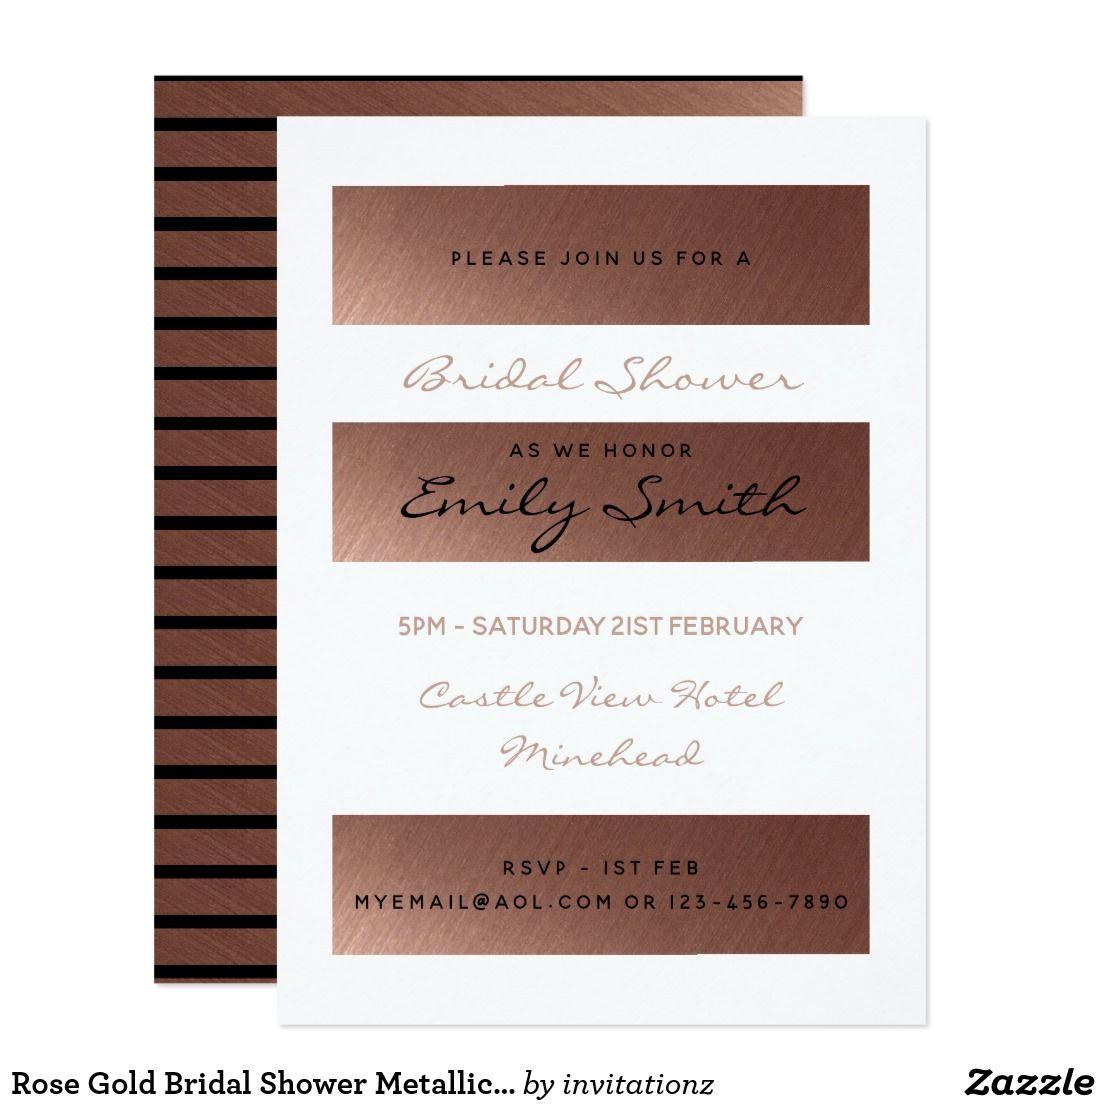 Wedding decorations to make february 2019 Rose Gold Bridal Shower Metallic Modern Chic Card  Trending Wedding